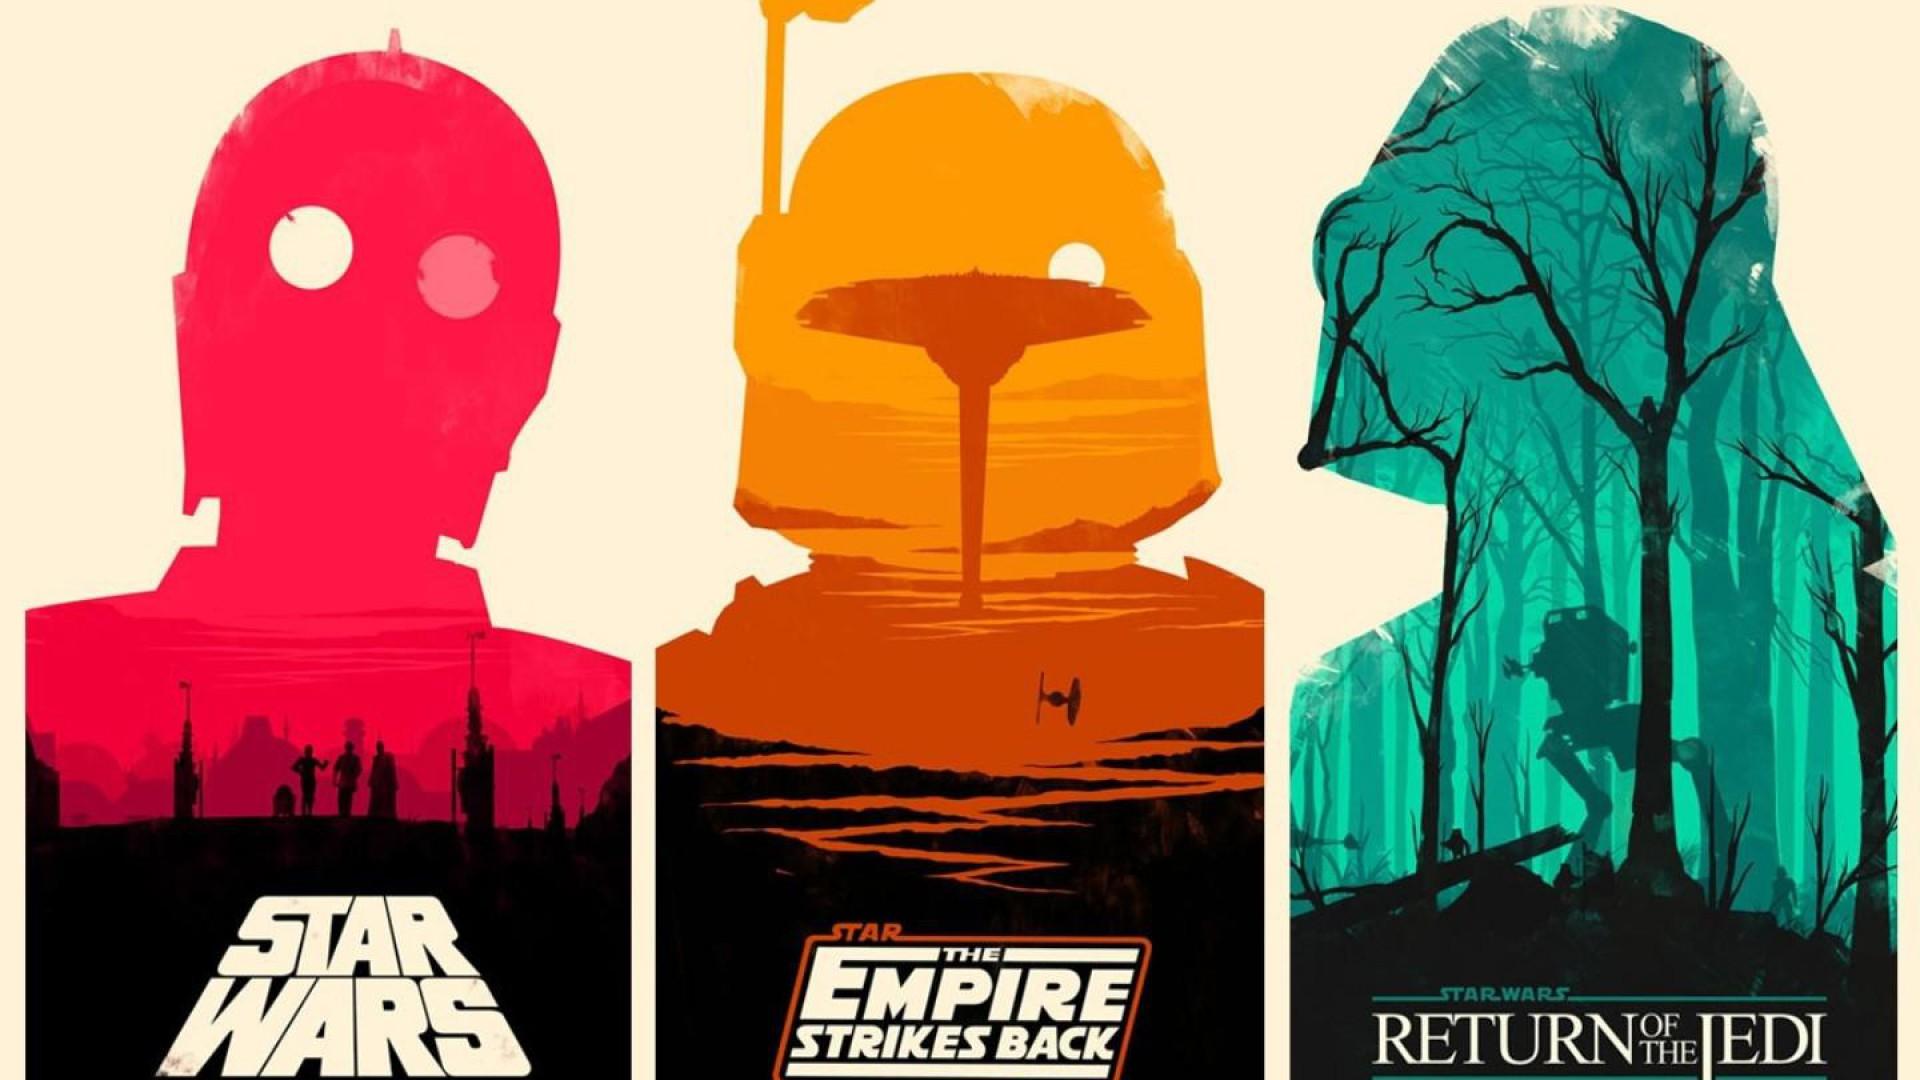 295 2952150 star wars original trilogy art